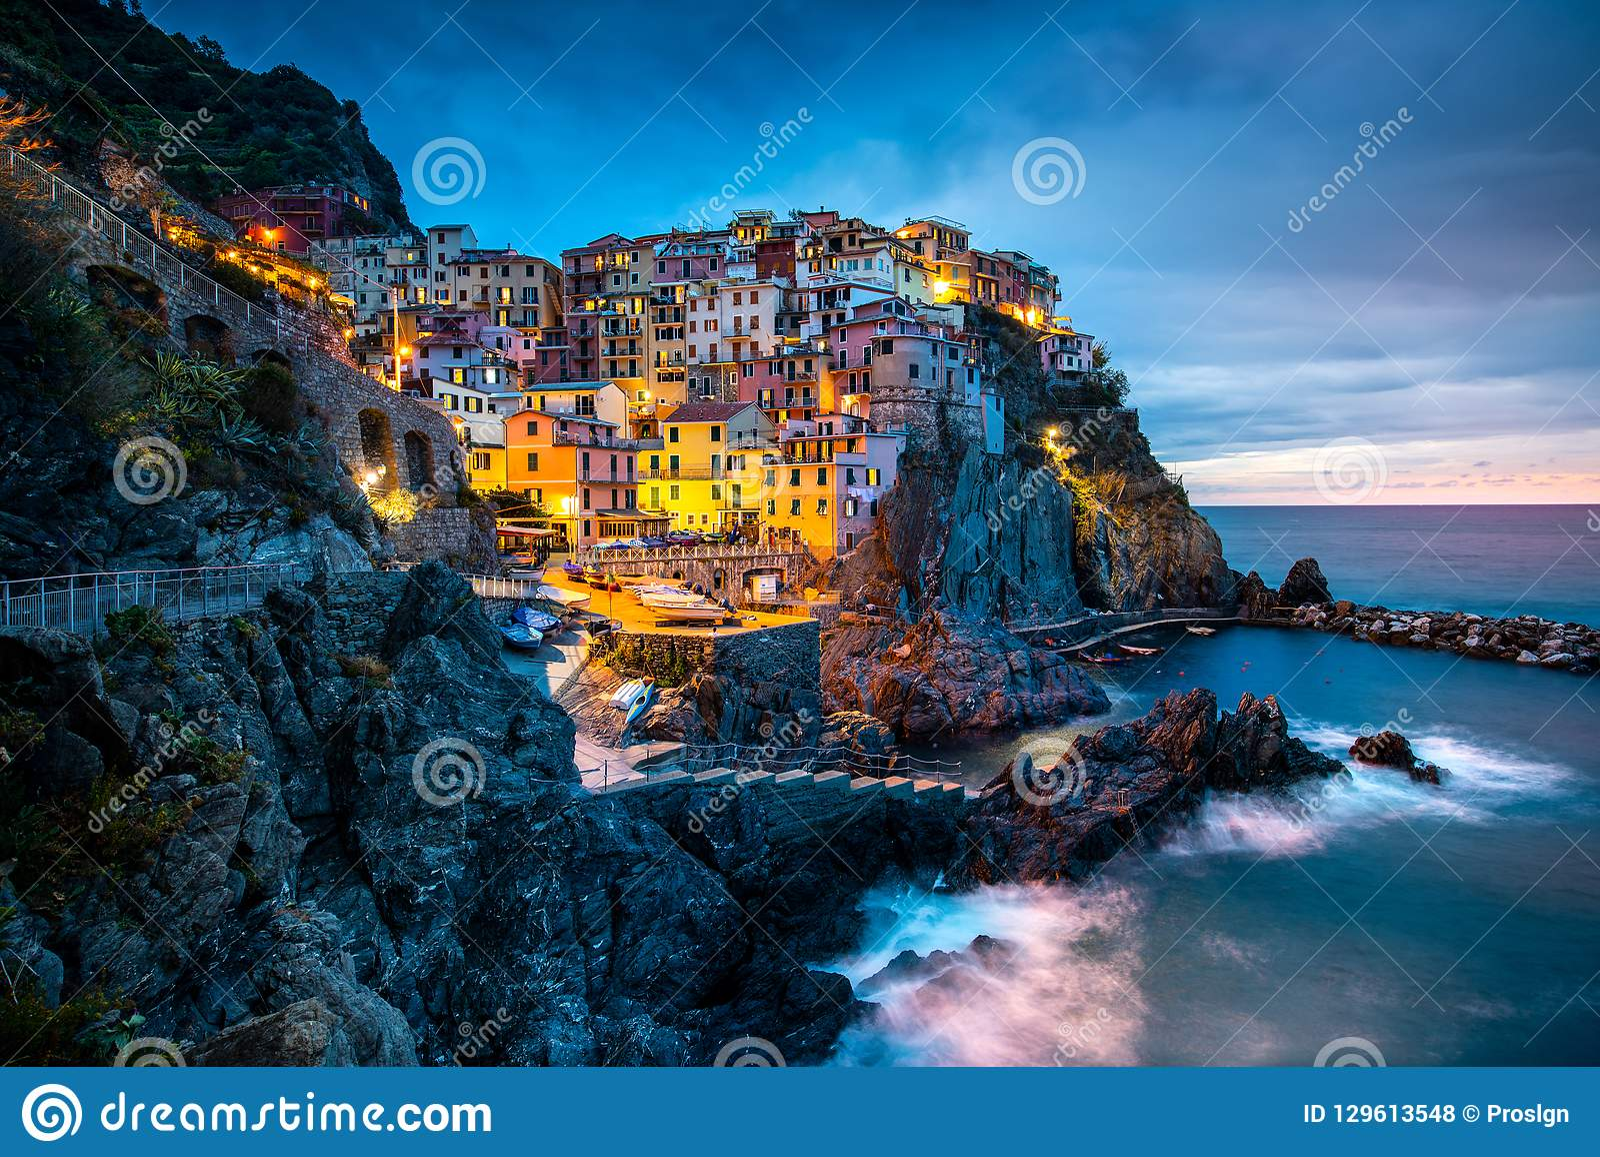 Manarola村庄,意大利的五乡地海岸 Manarola拉斯佩齐亚,利古里亚省的一美丽的小镇,在北部